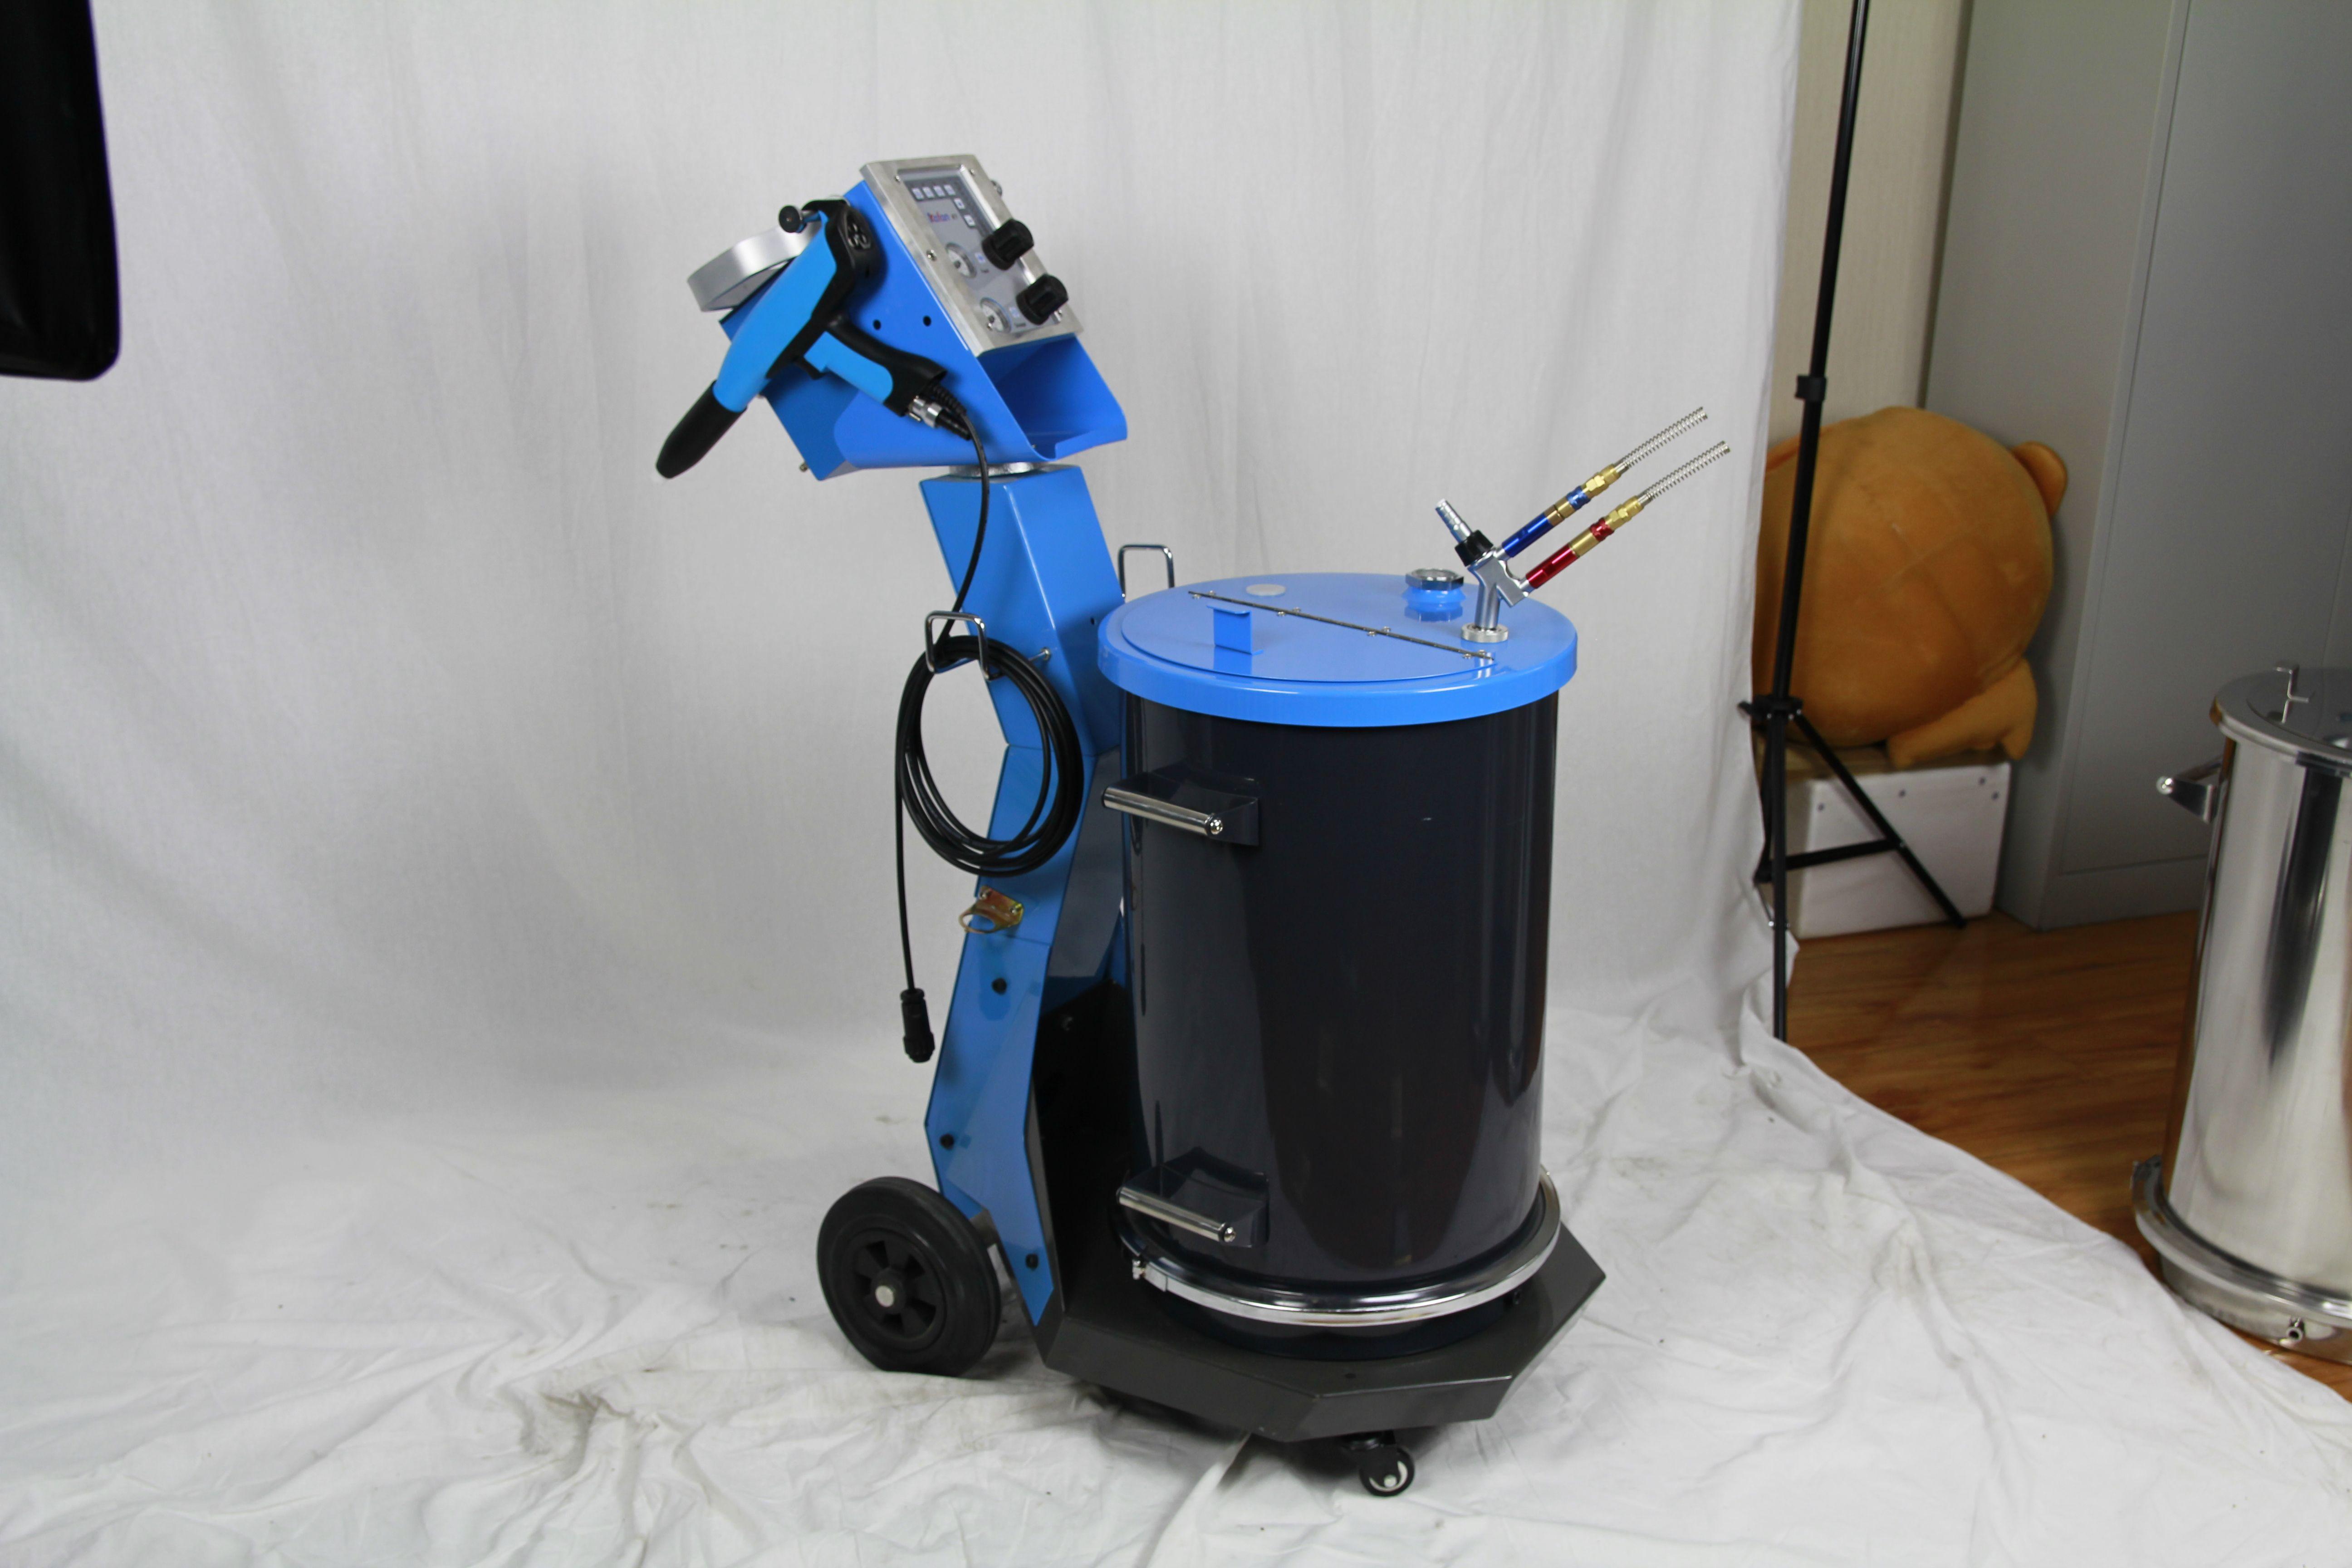 Powder Coat Spray Paint Machine Supplier Do It Yourself Coating Máquina De Revestimiento Polvo Metal Машина для